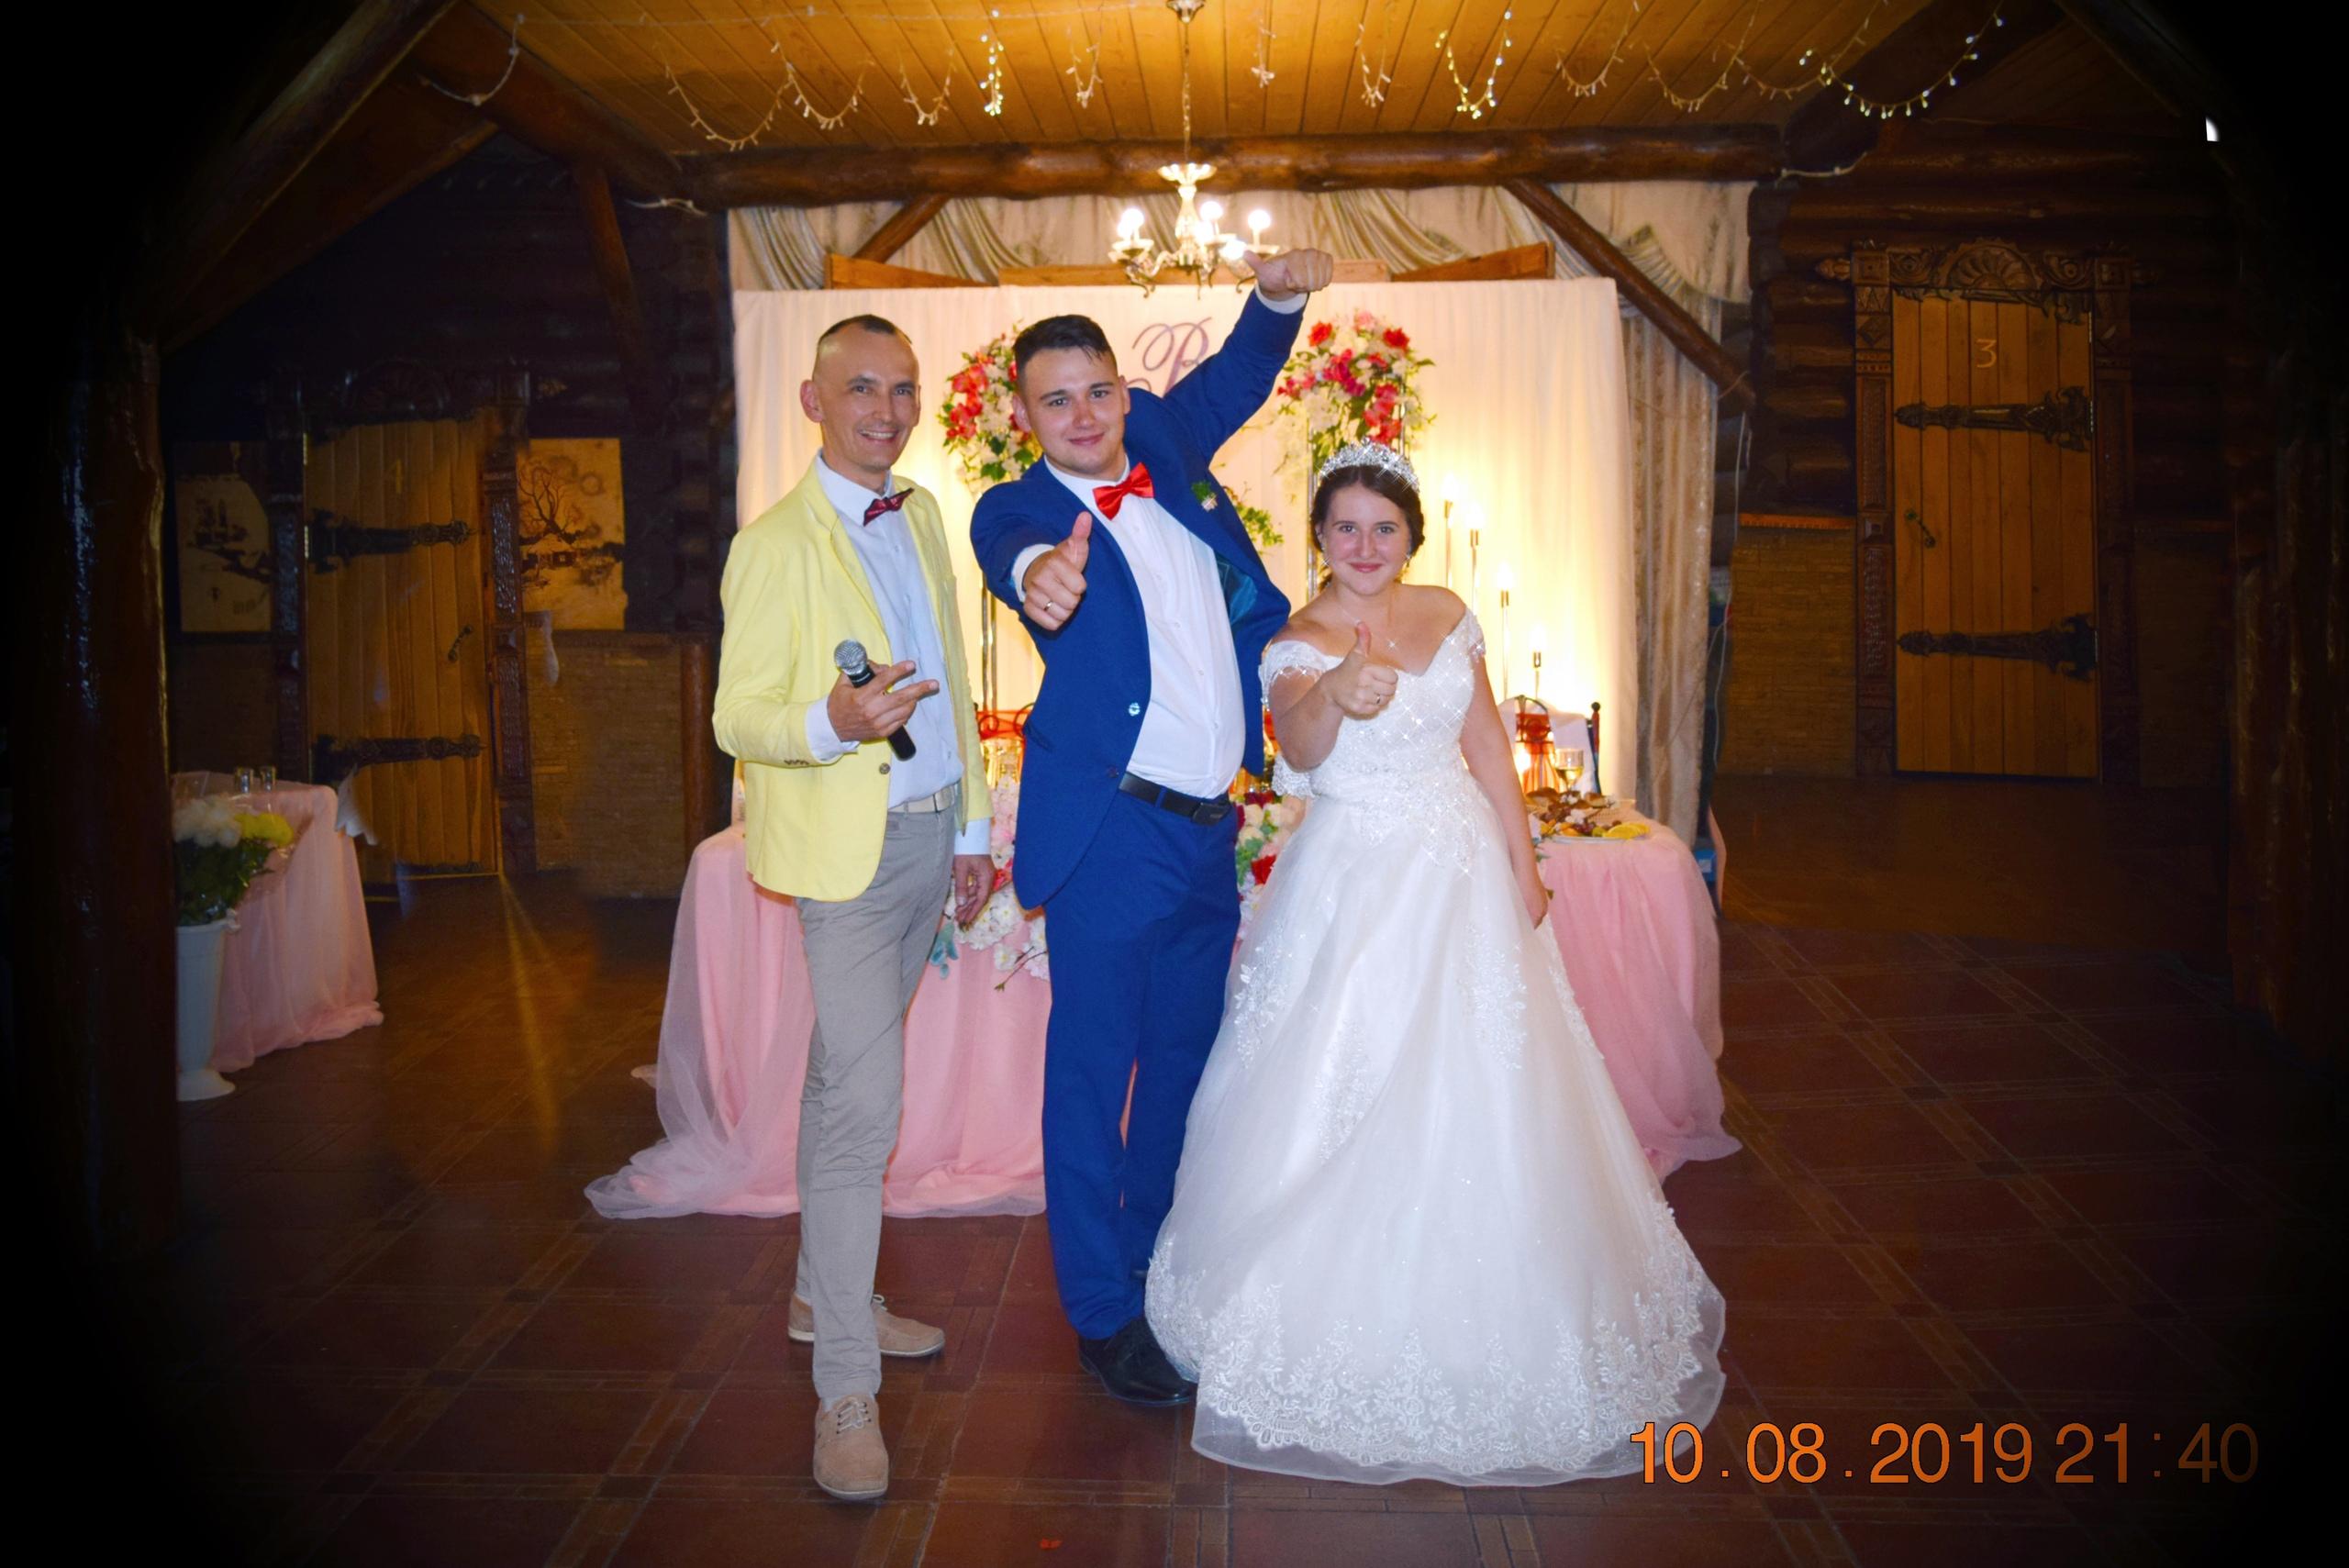 GQT3R dHOuE - Свадьба Вадима и Анастасии